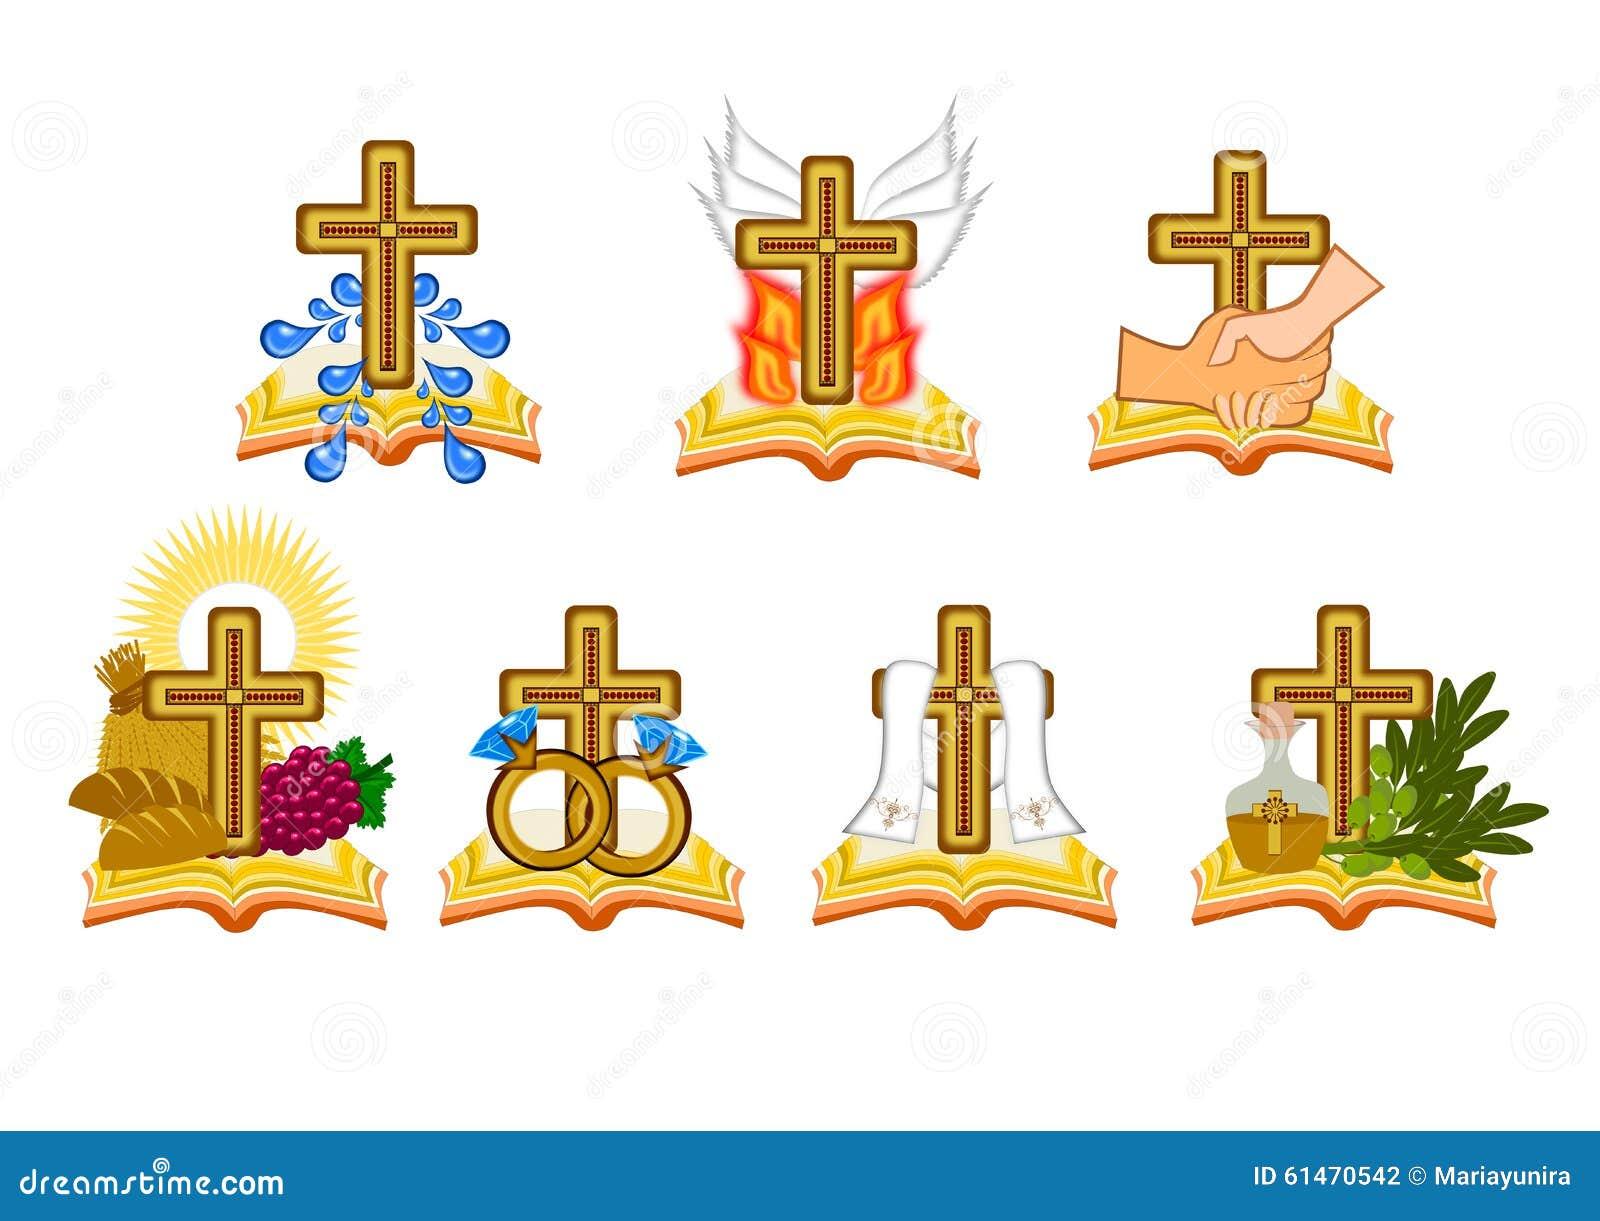 the seven sacraments of the catholic church pdf